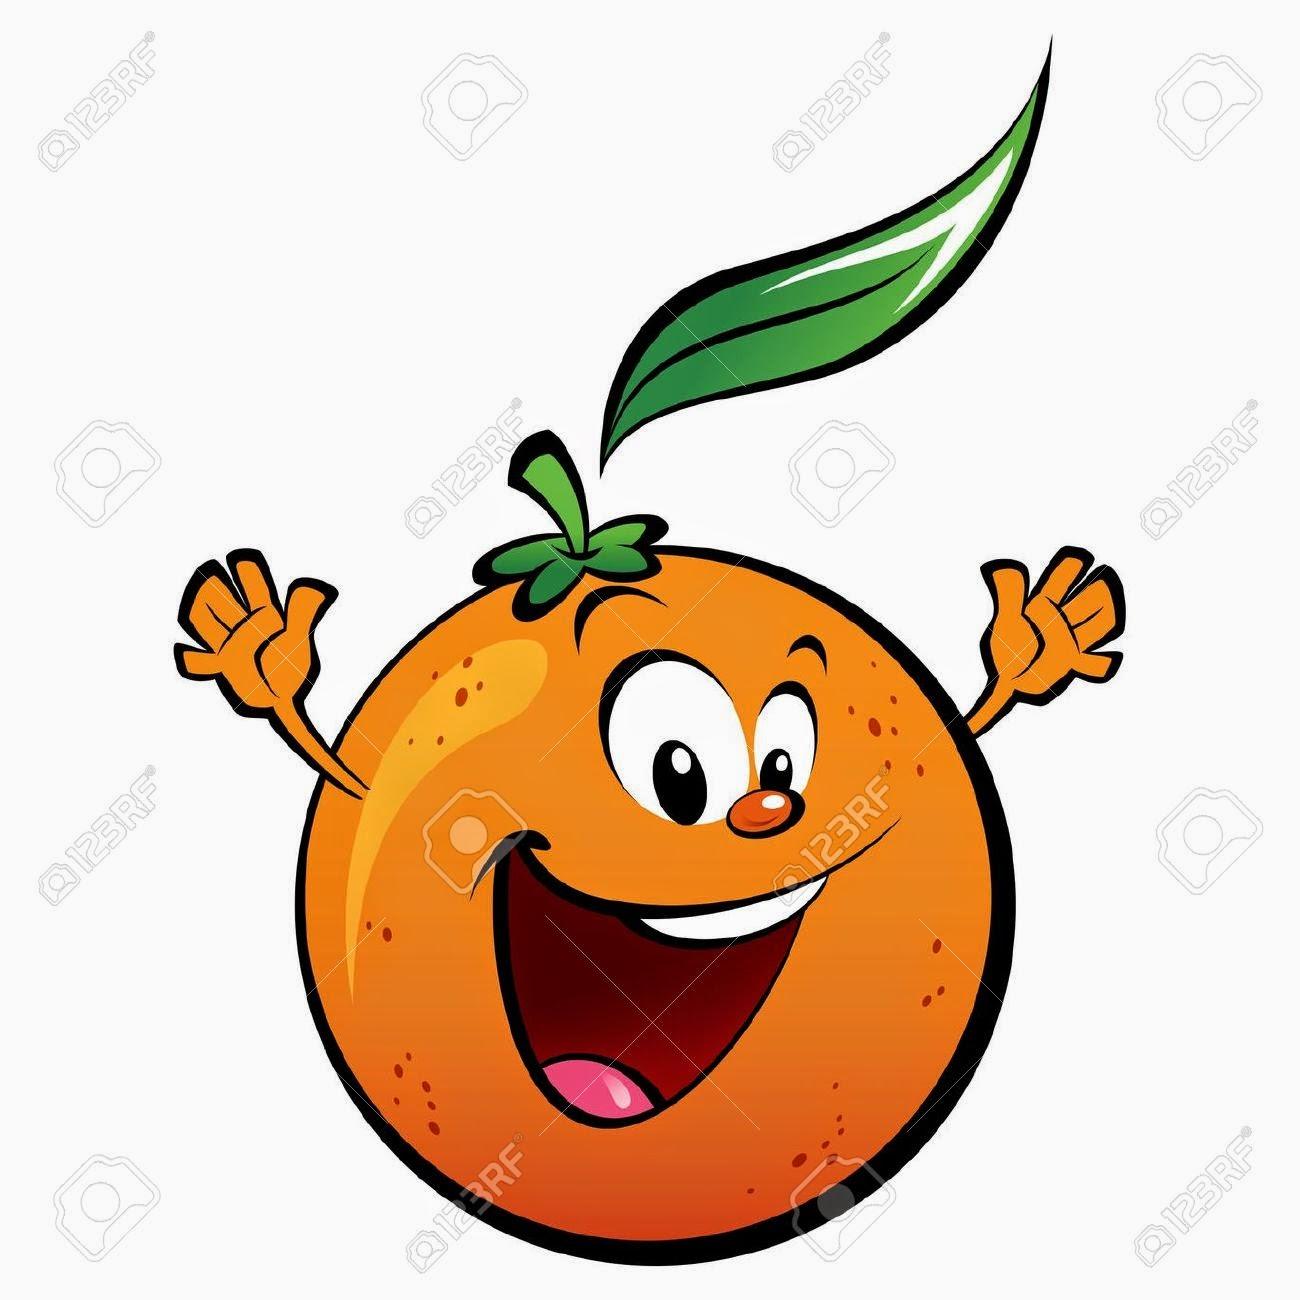 BLOG  SANTA ANA  SABI Plan fruta en el recreo Esta semana